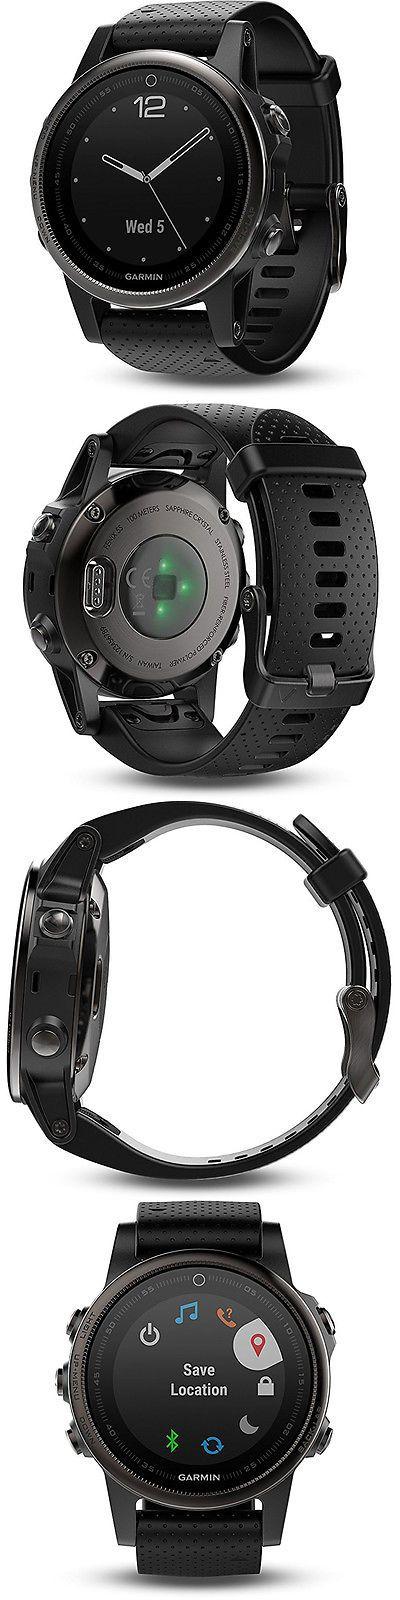 GPS Units: Garmin Fenix 5S Sapphire Multisport 42Mm Gps Watch - Black With Black Band -> BUY IT NOW ONLY: $699.99 on eBay!